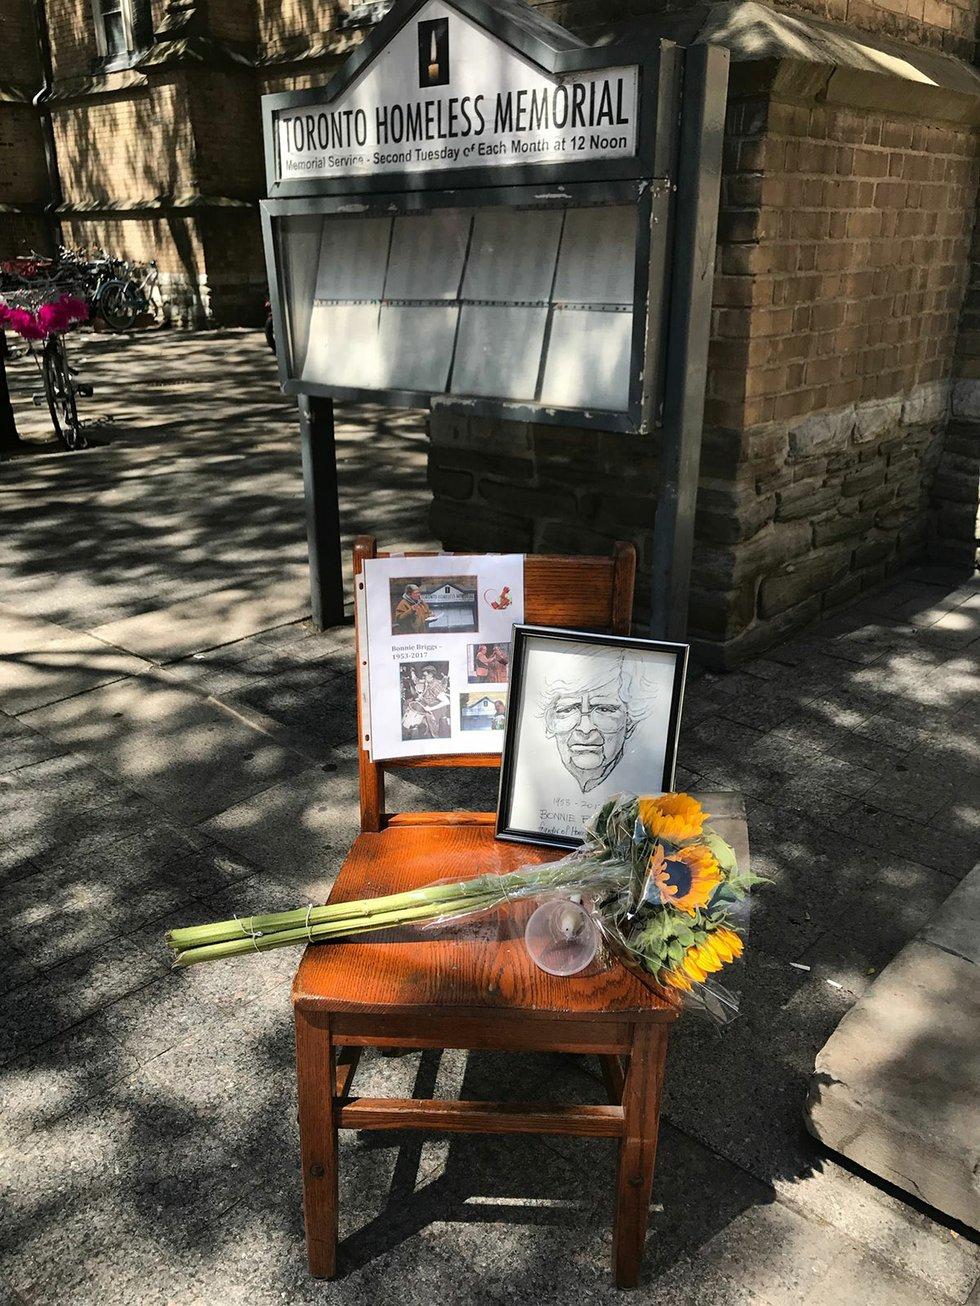 Bonnie-Briggs-Memorial.jpg